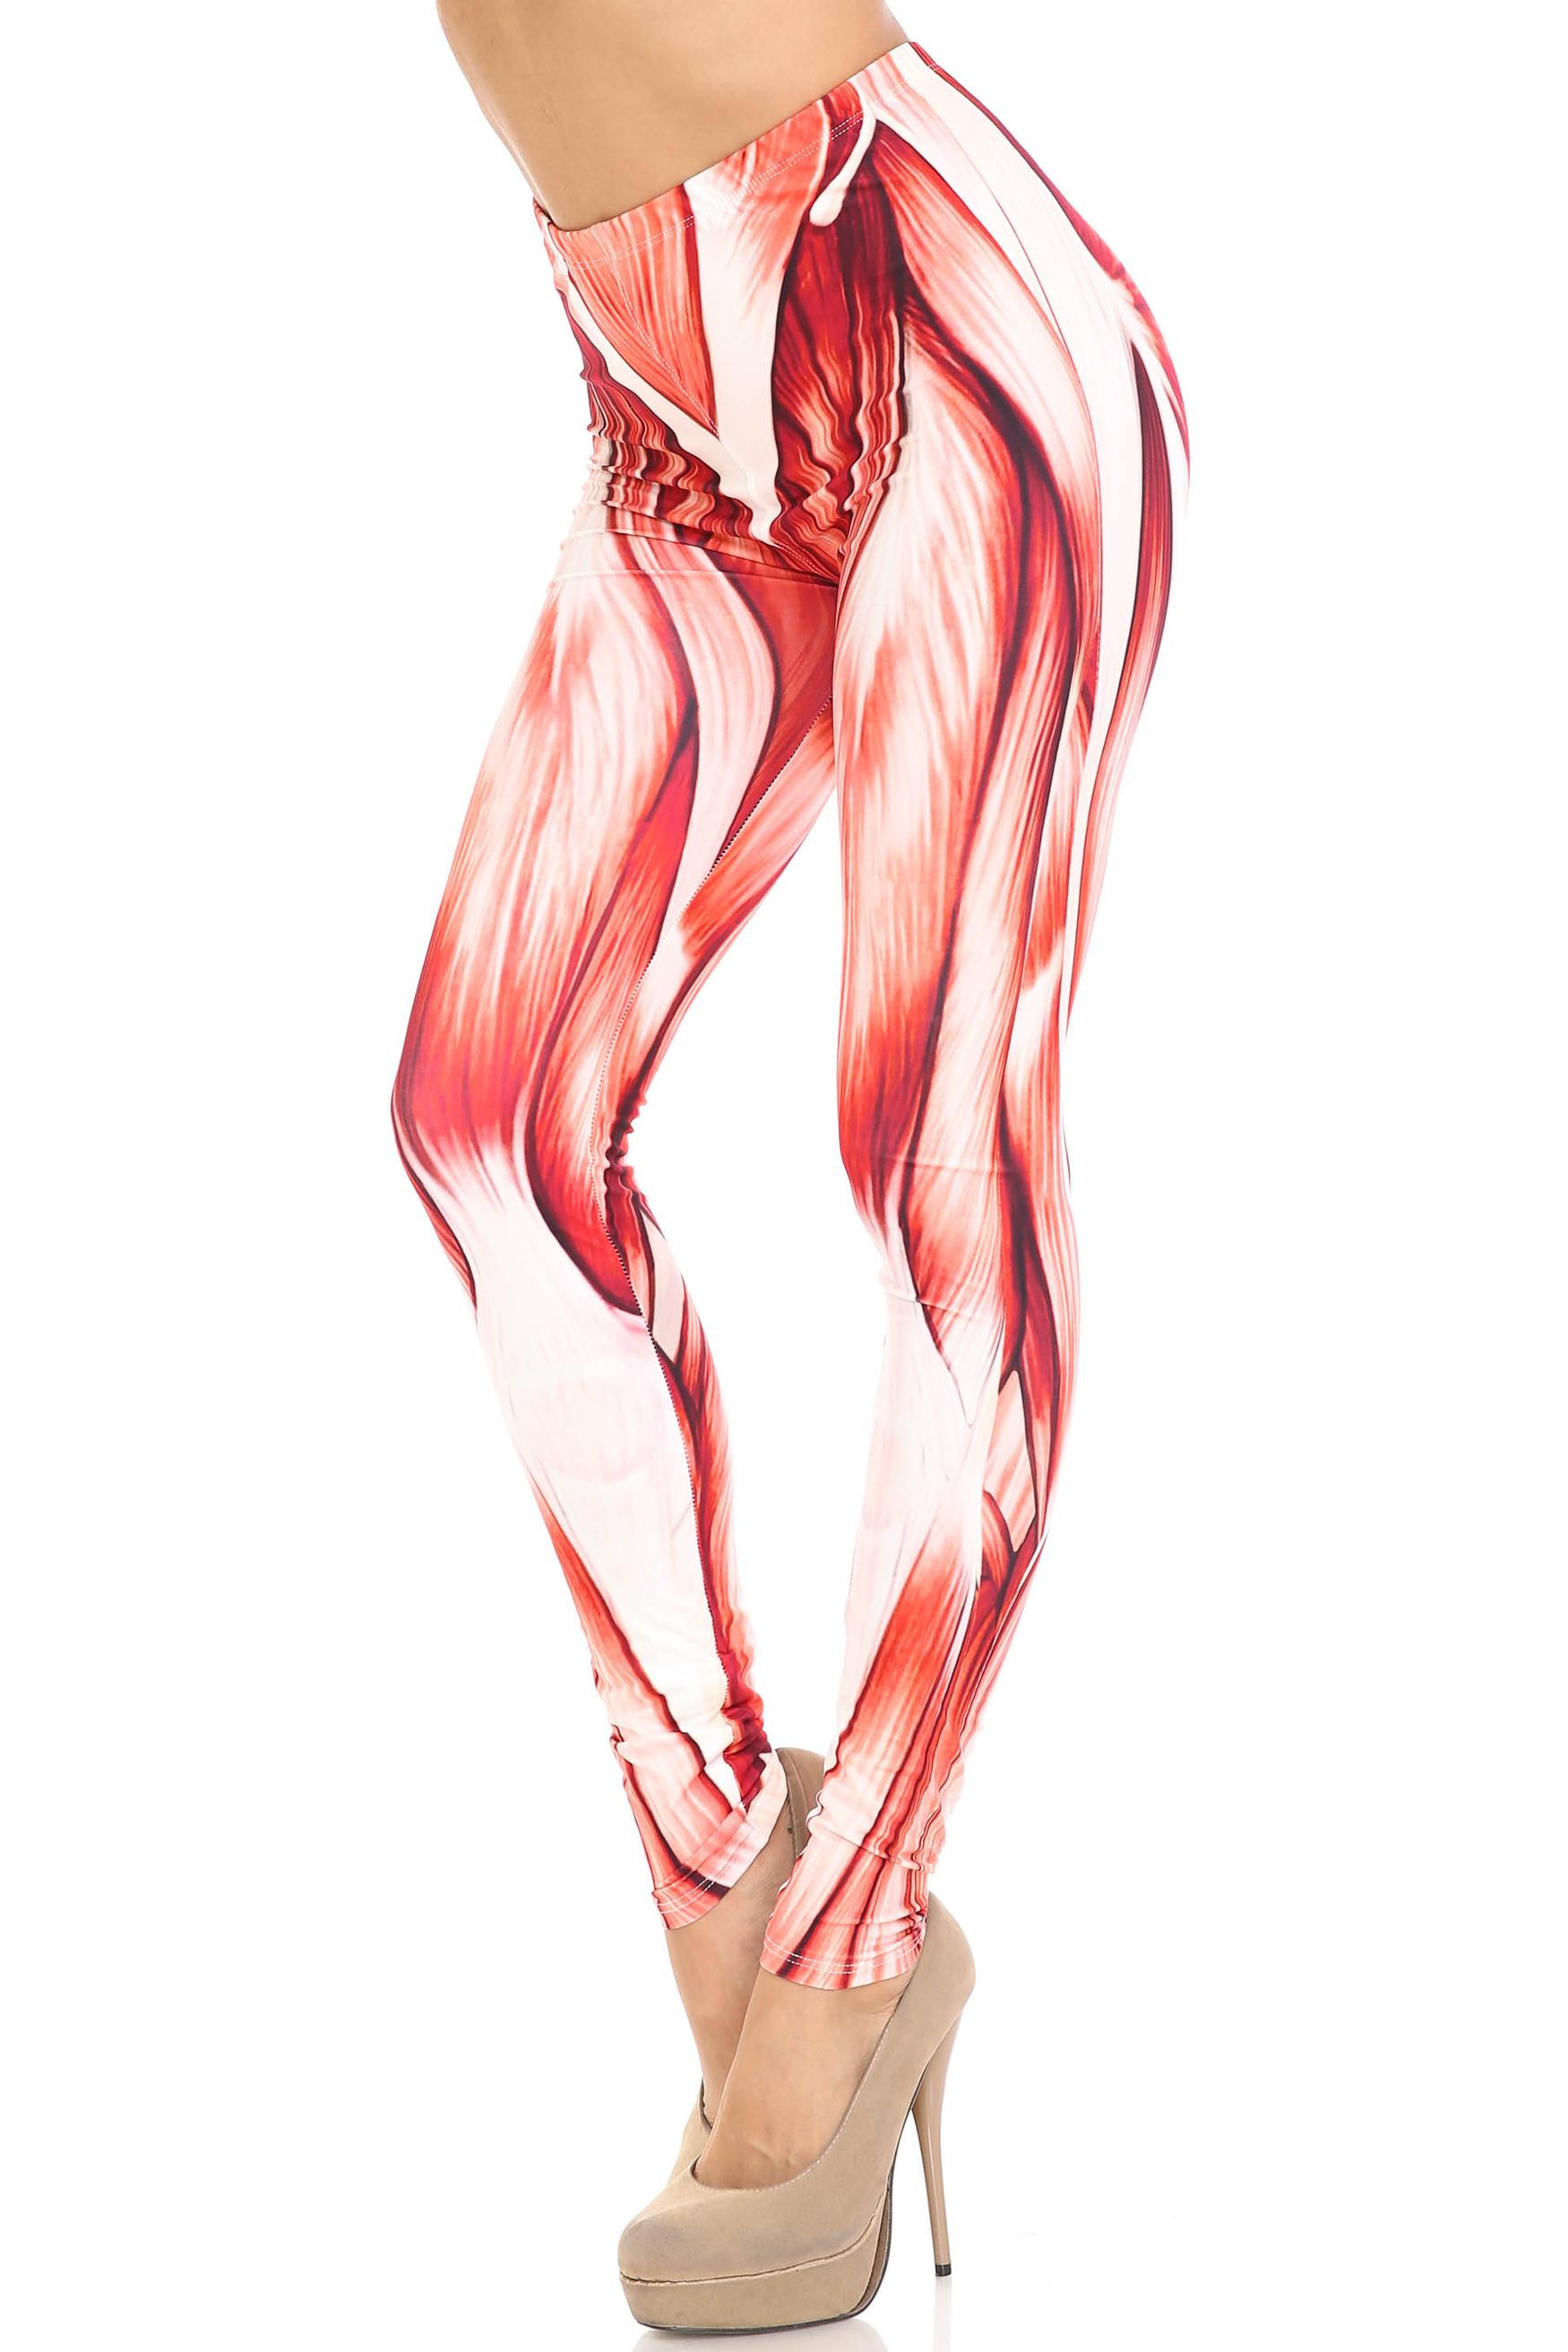 Creamy Soft Muscle Leggings - By USA Fashion™